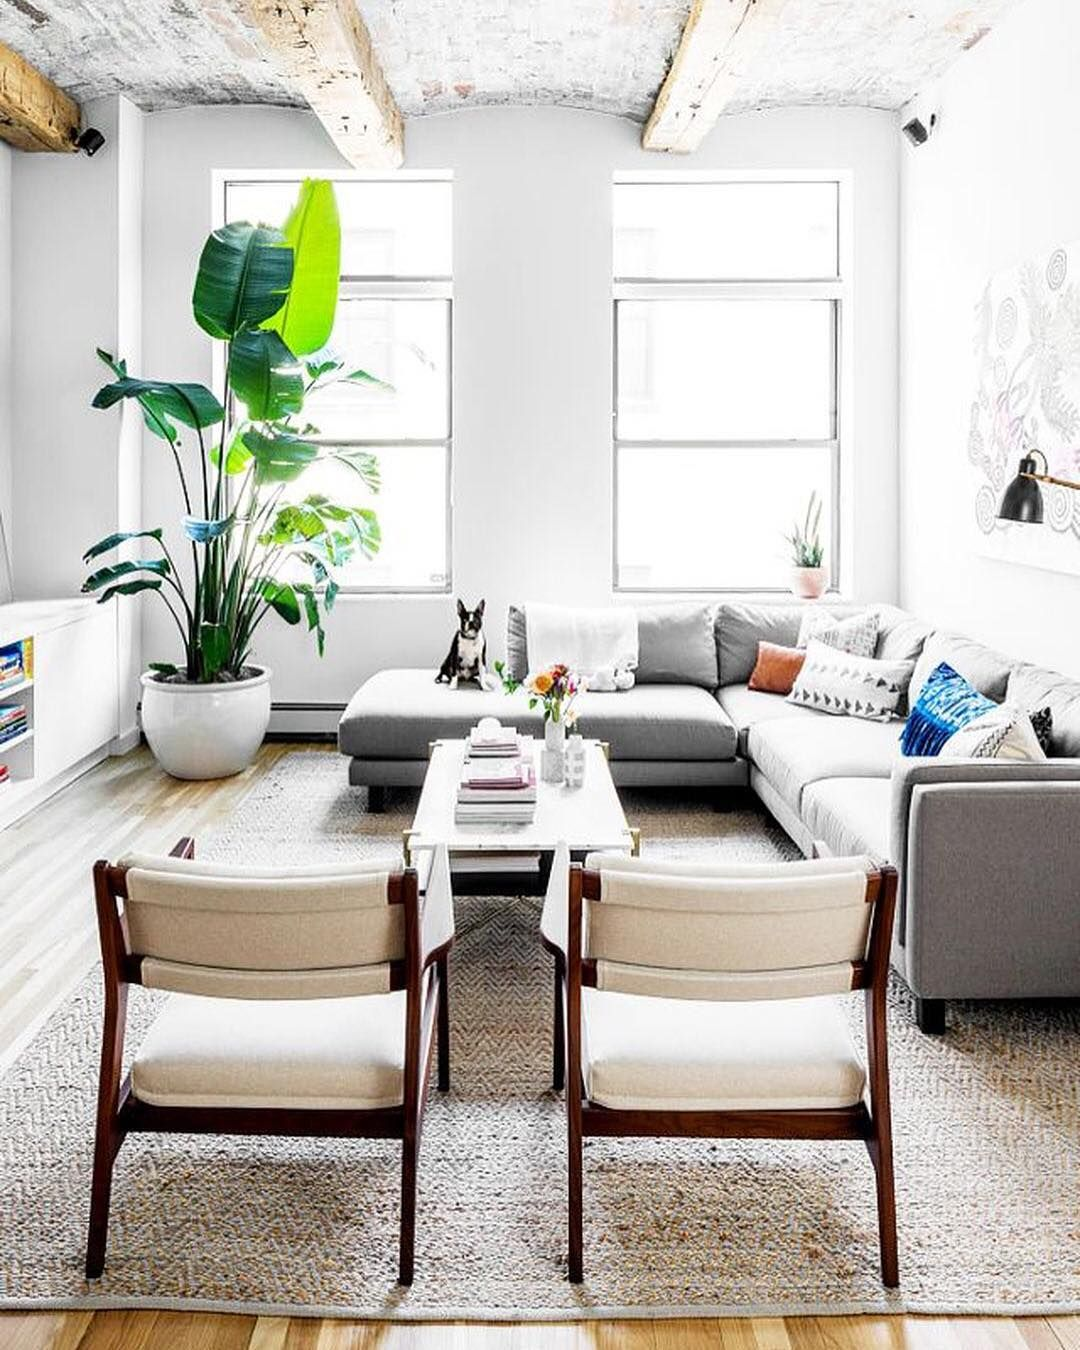 pin by jessica chang on home interior 2017 decor home decor rh pinterest com